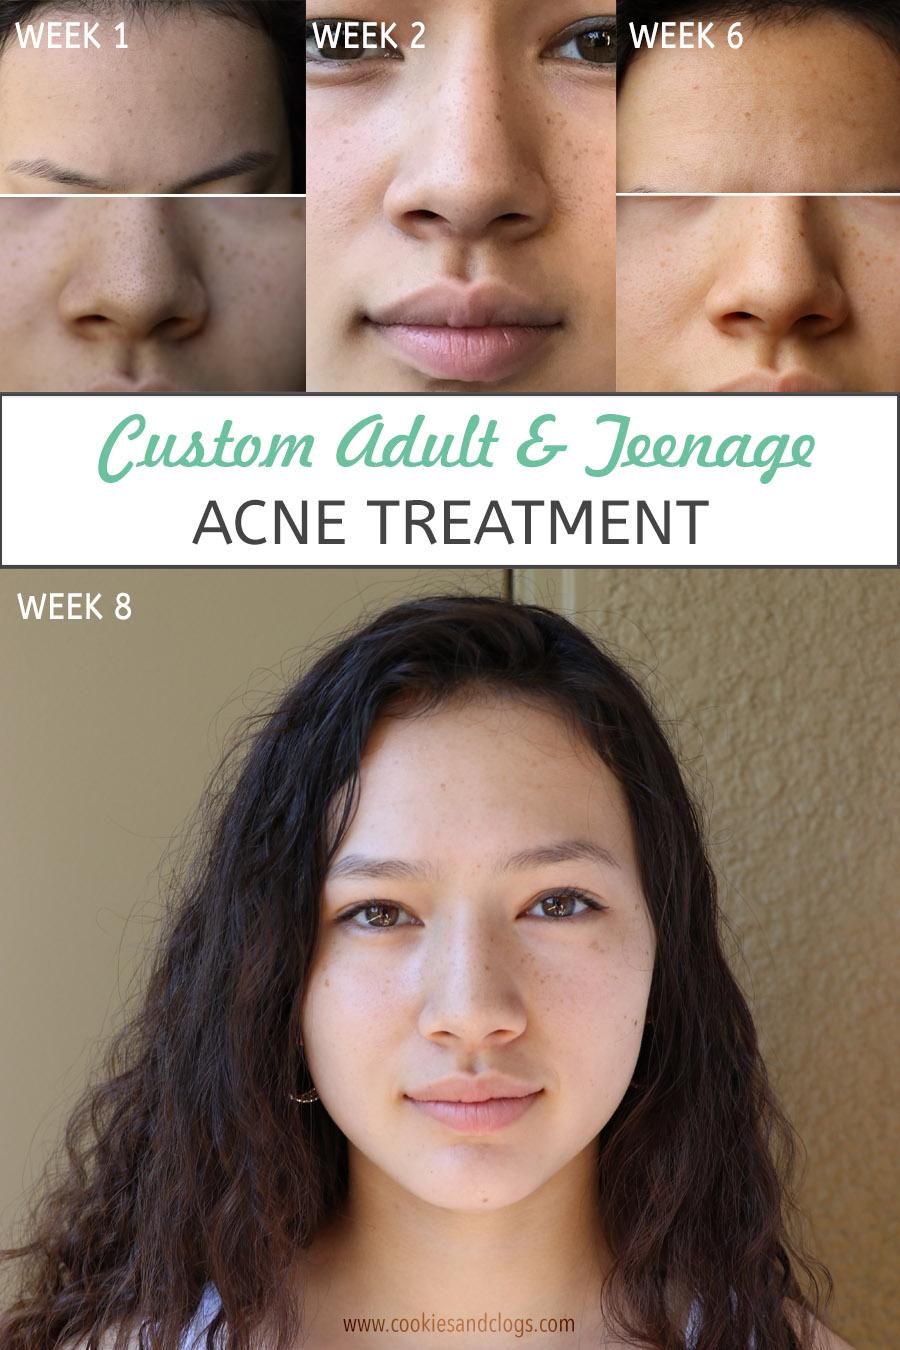 Custom teenage acne treatment w/ Curology